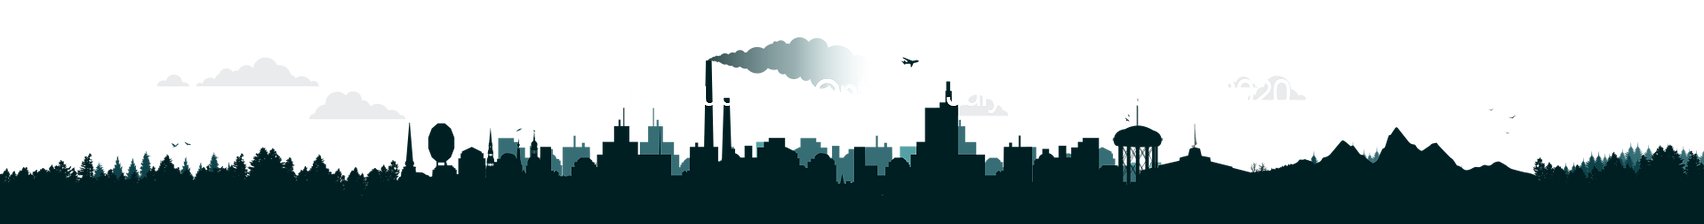 sudbury-skyline-illustration1.png